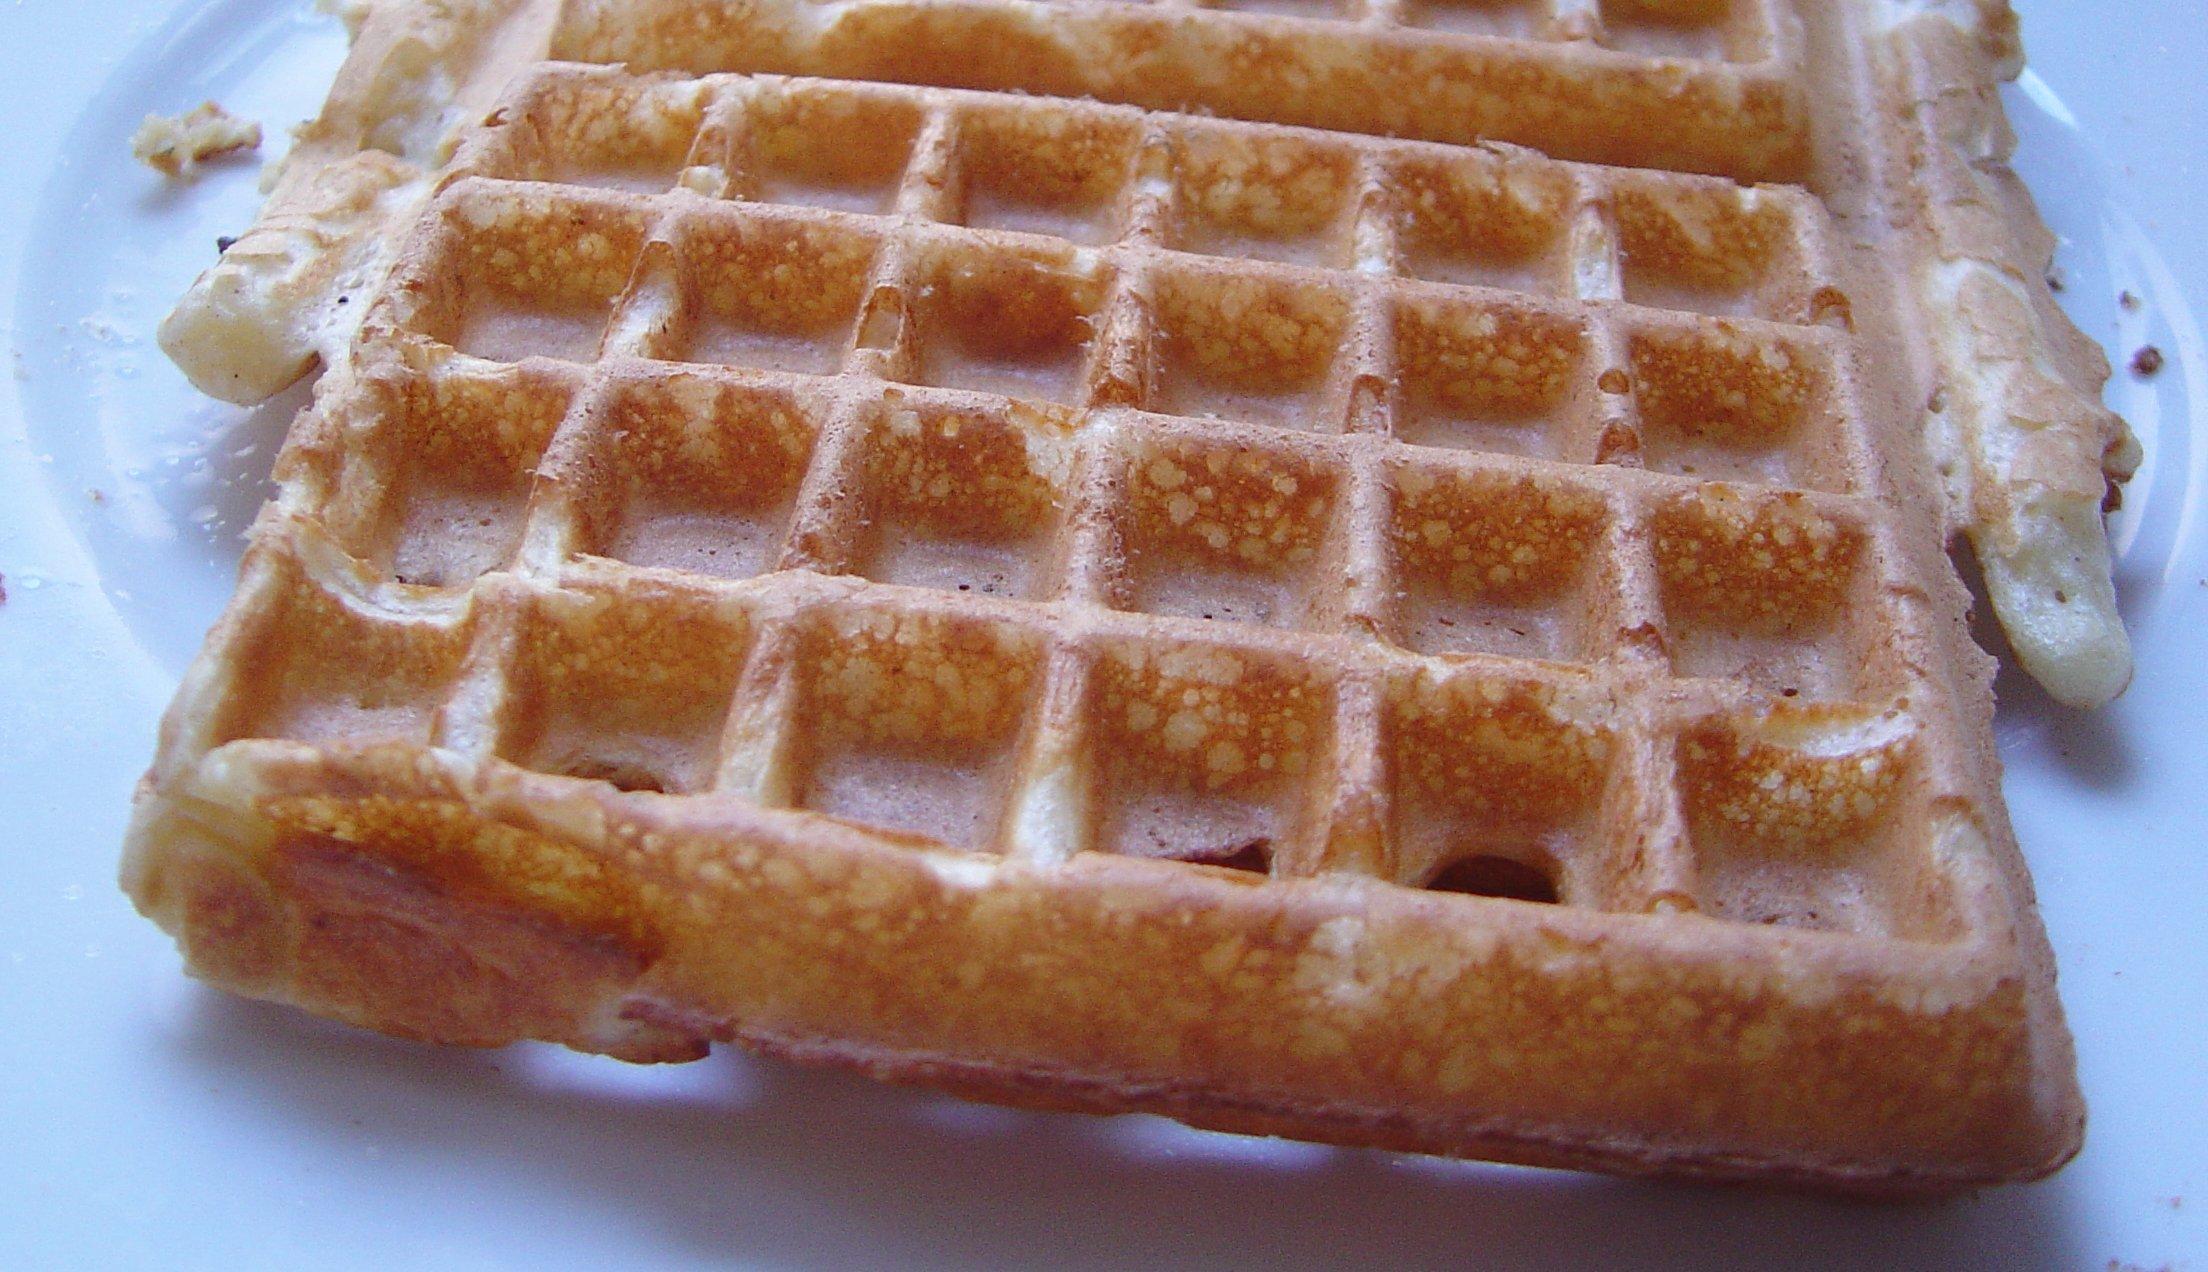 Waffle - Simple English Wikipedia, the free encyclopedia